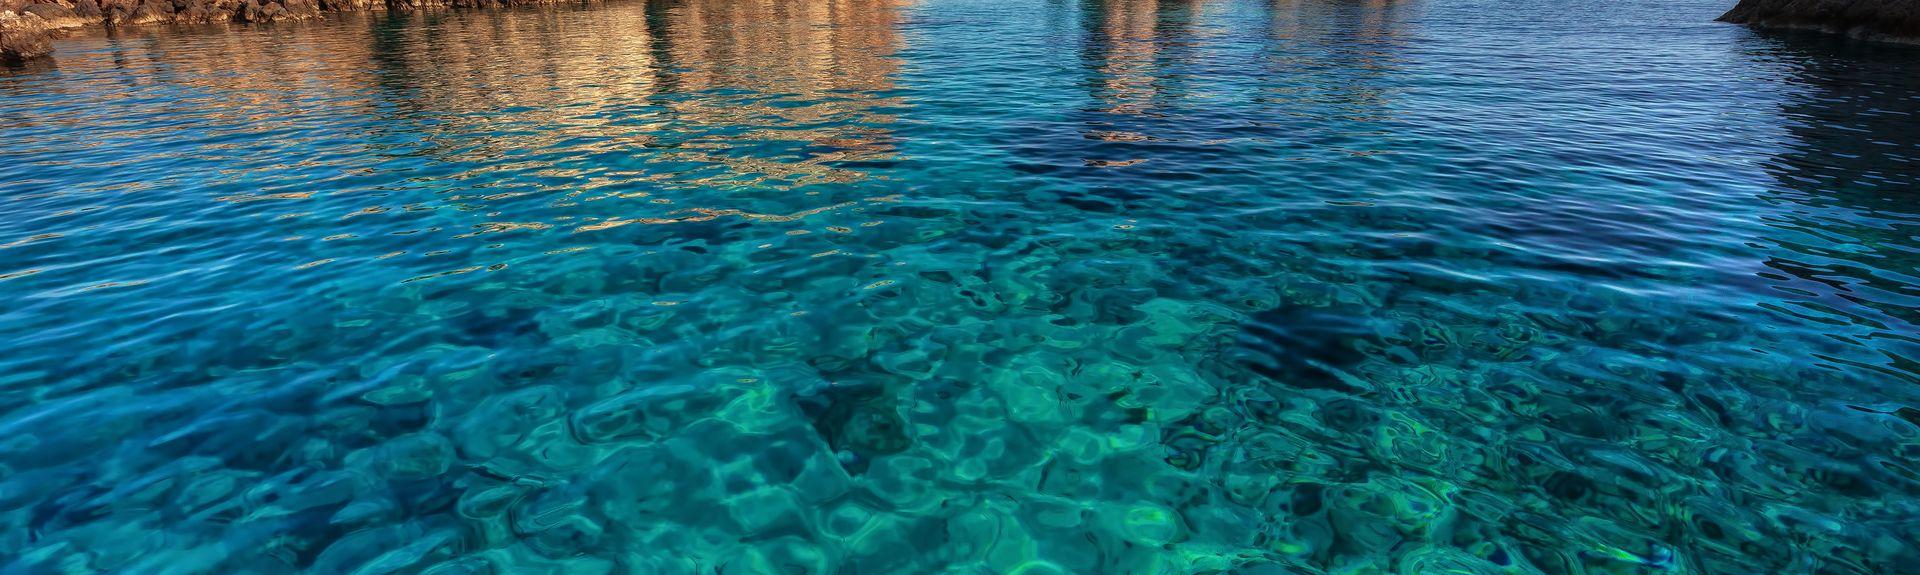 Antiparos Island, Νησιά του Αιγαίου, Ελλάδα